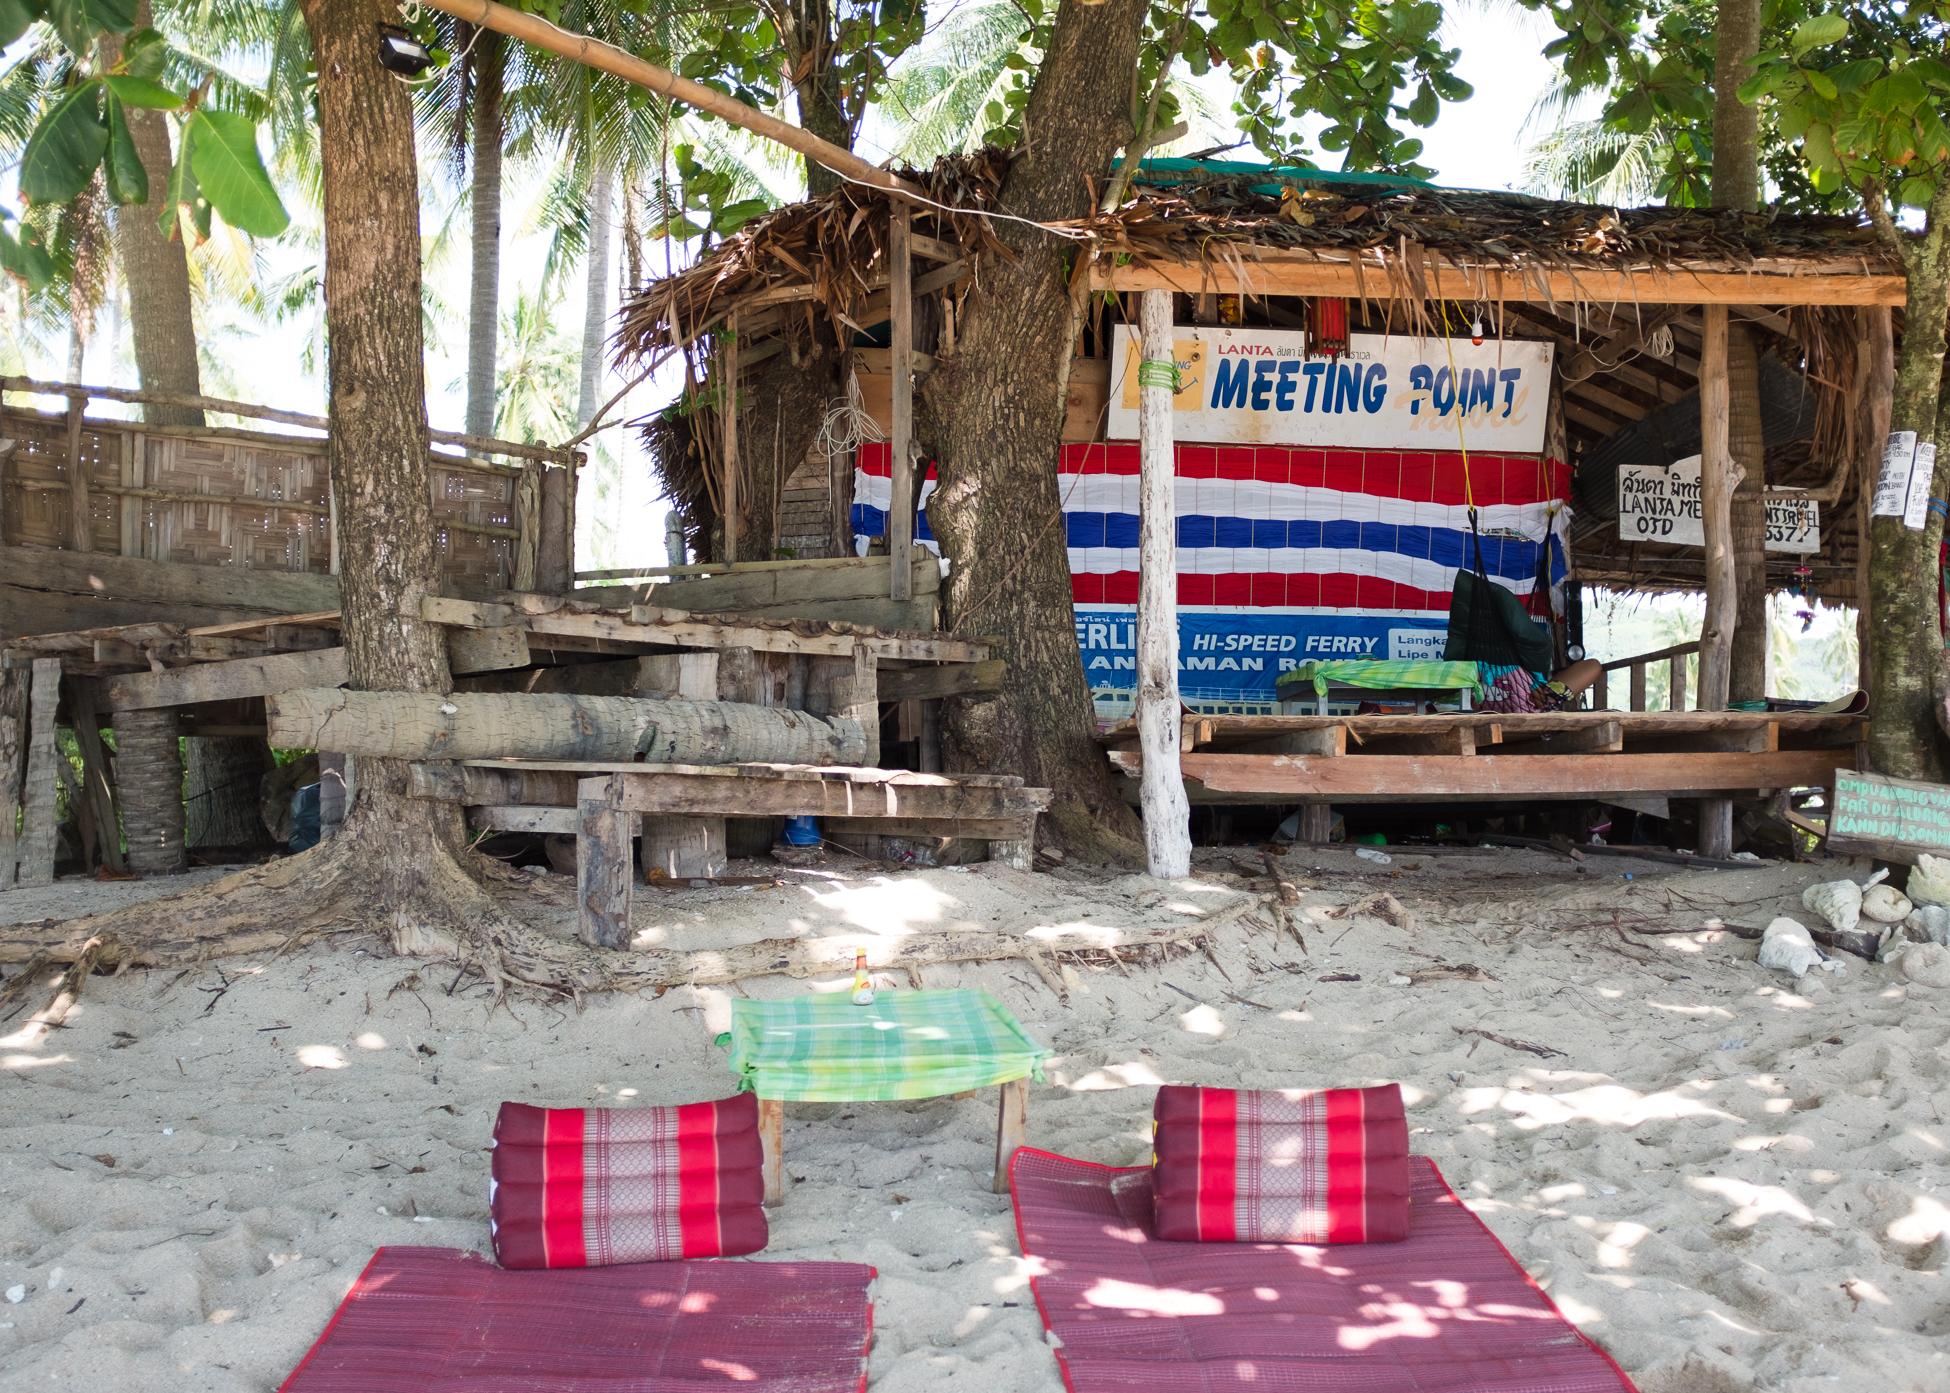 Meeting Point, Thailand, 2015